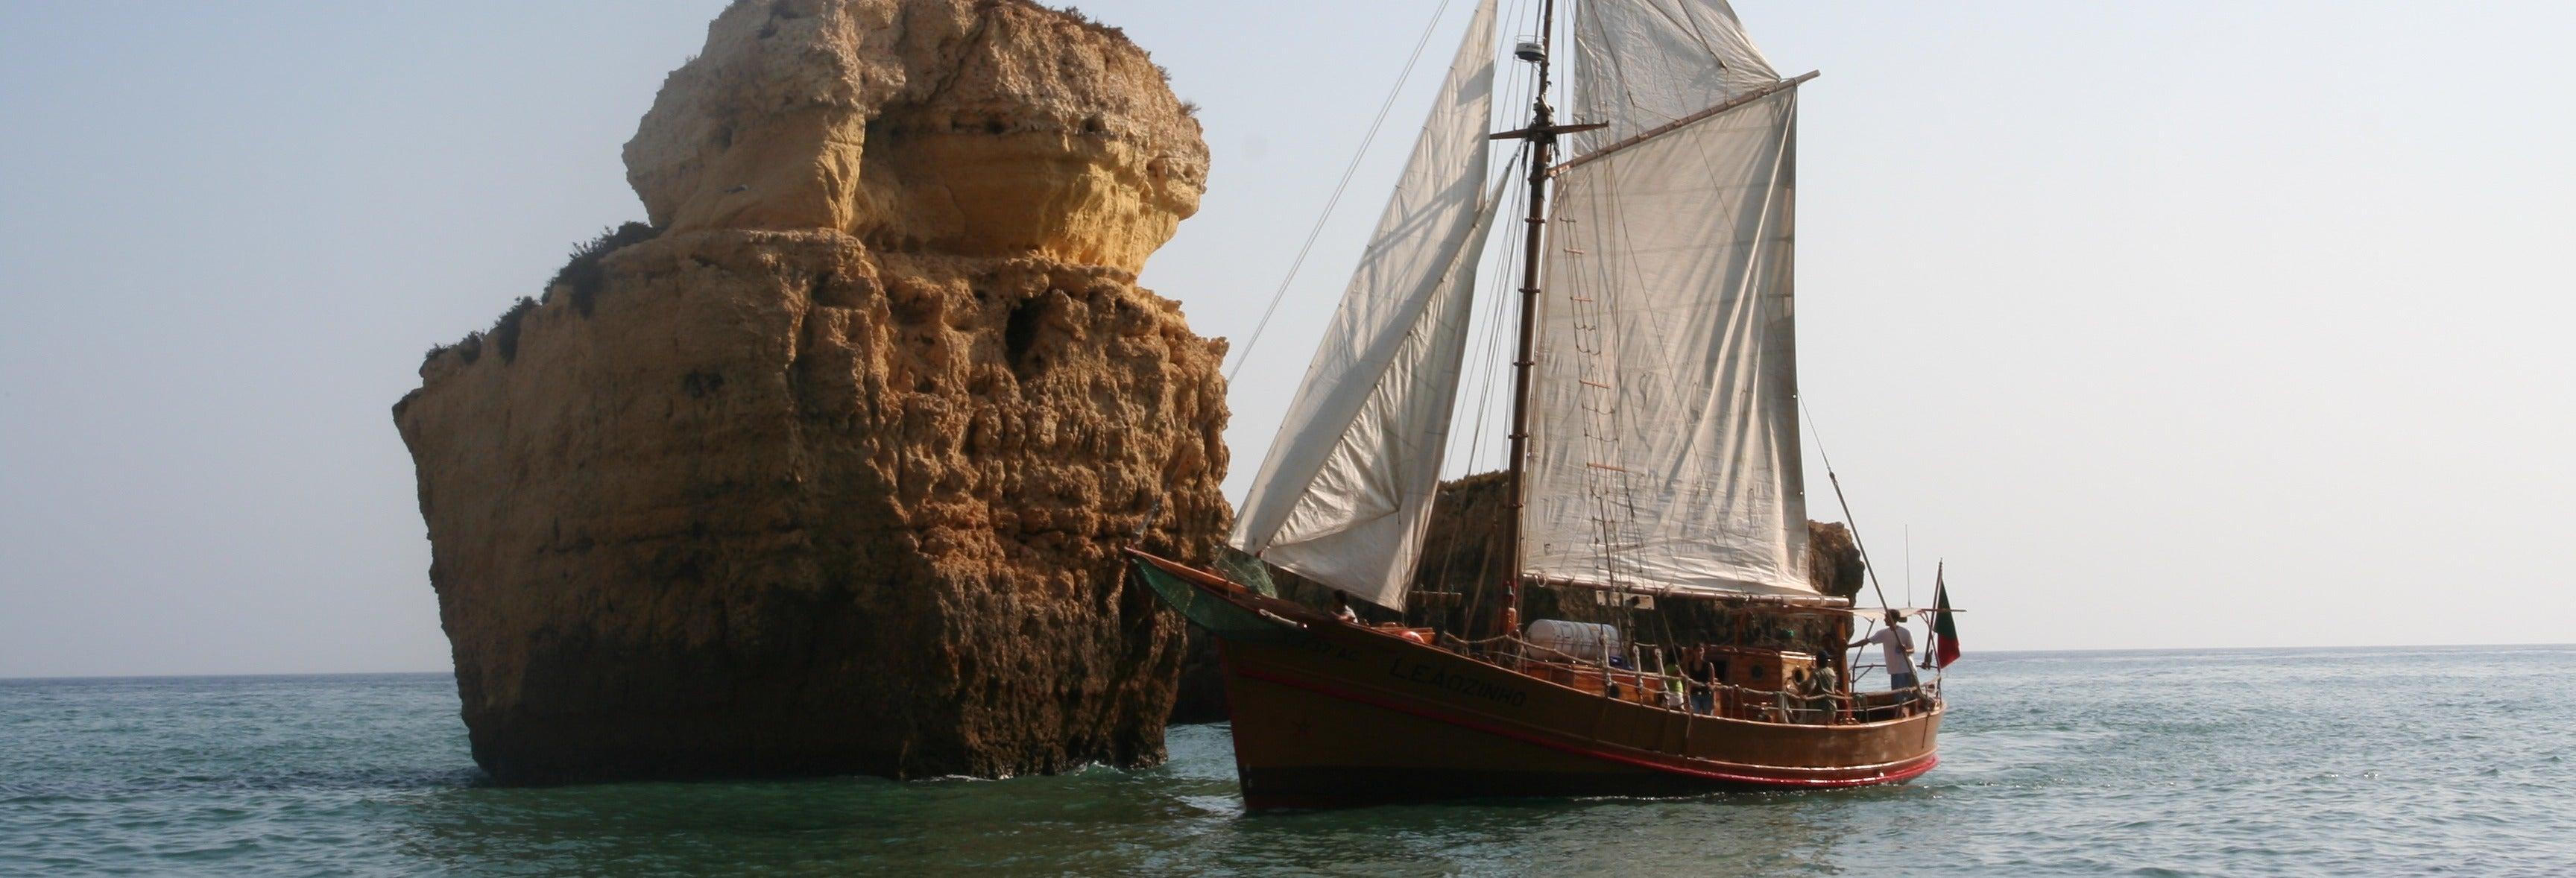 Albufeira Pirate Ship BBQ Cruise